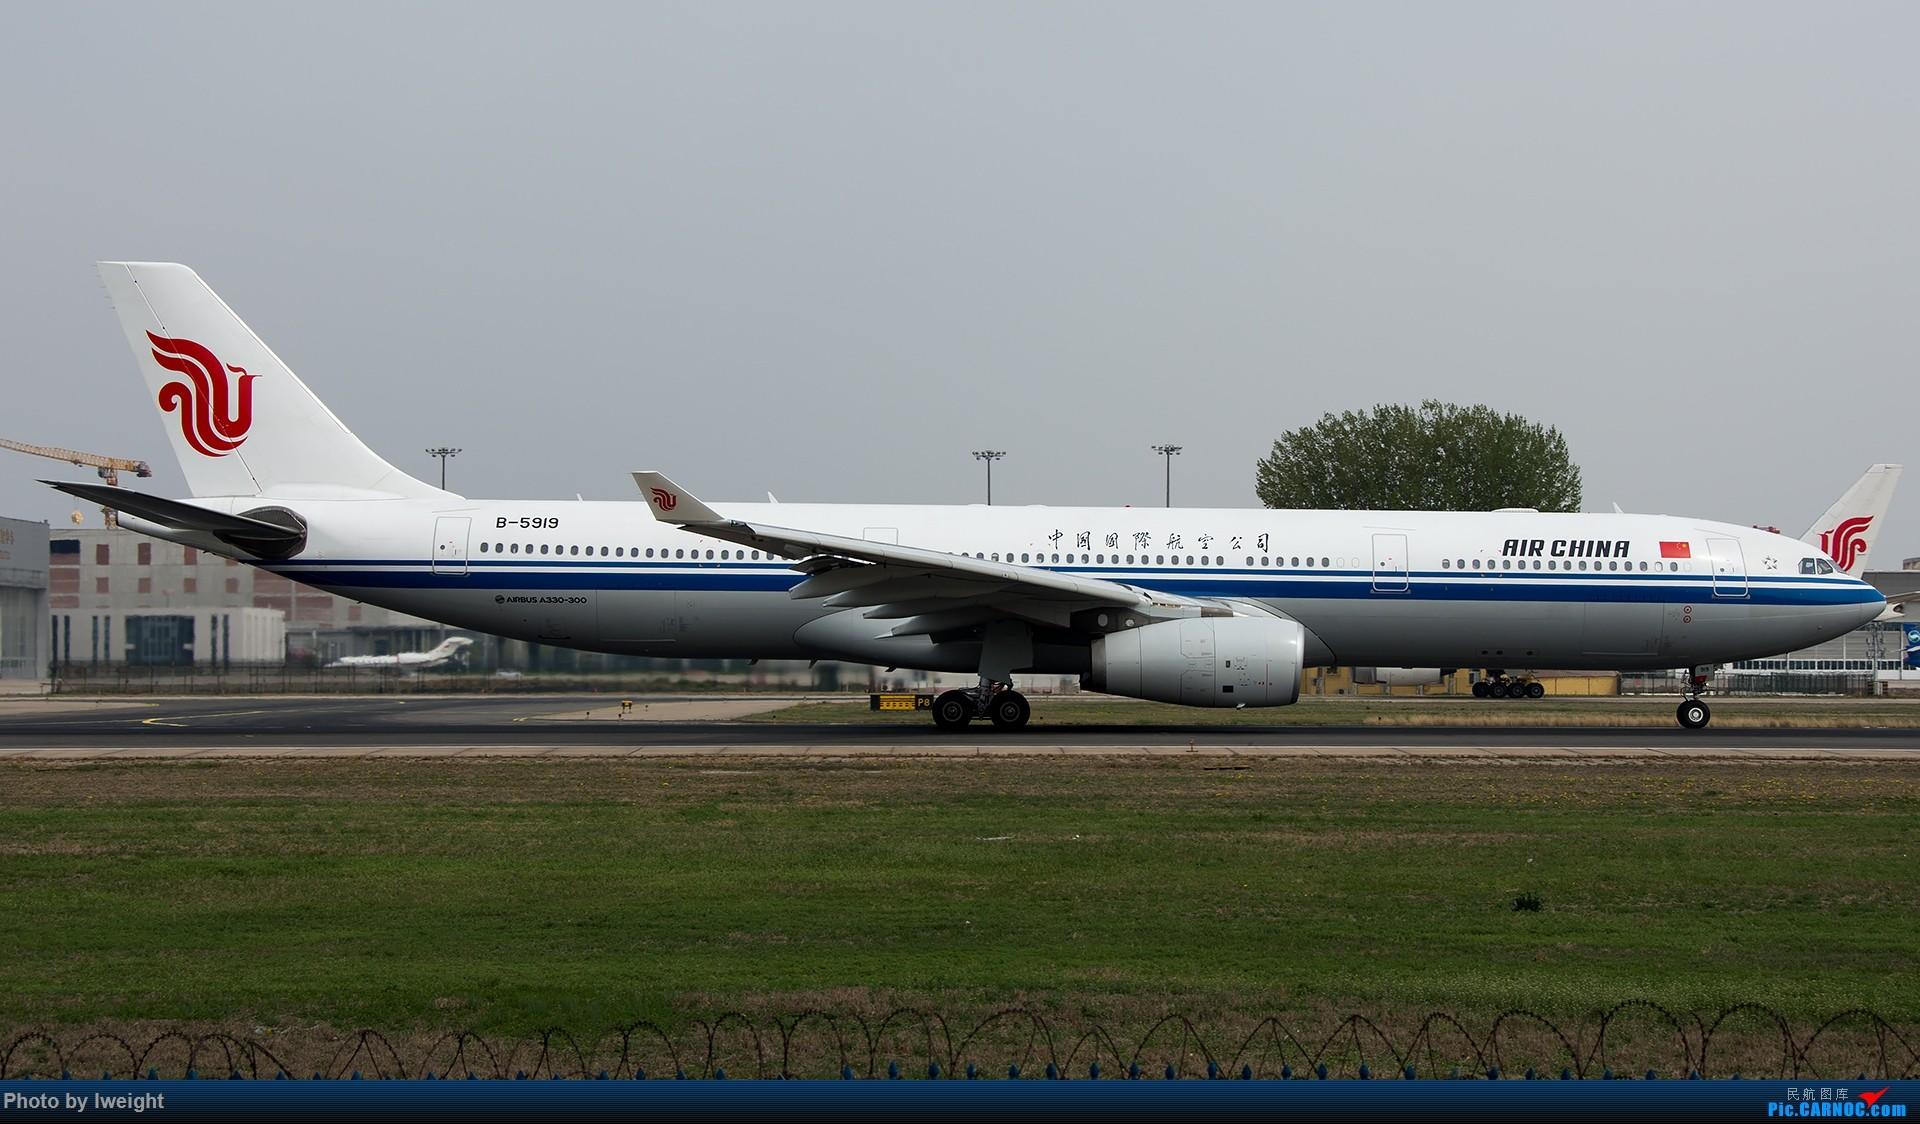 Re:[原创]霾,18R,高密度 AIRBUS A330-300 B-5919 中国北京首都国际机场